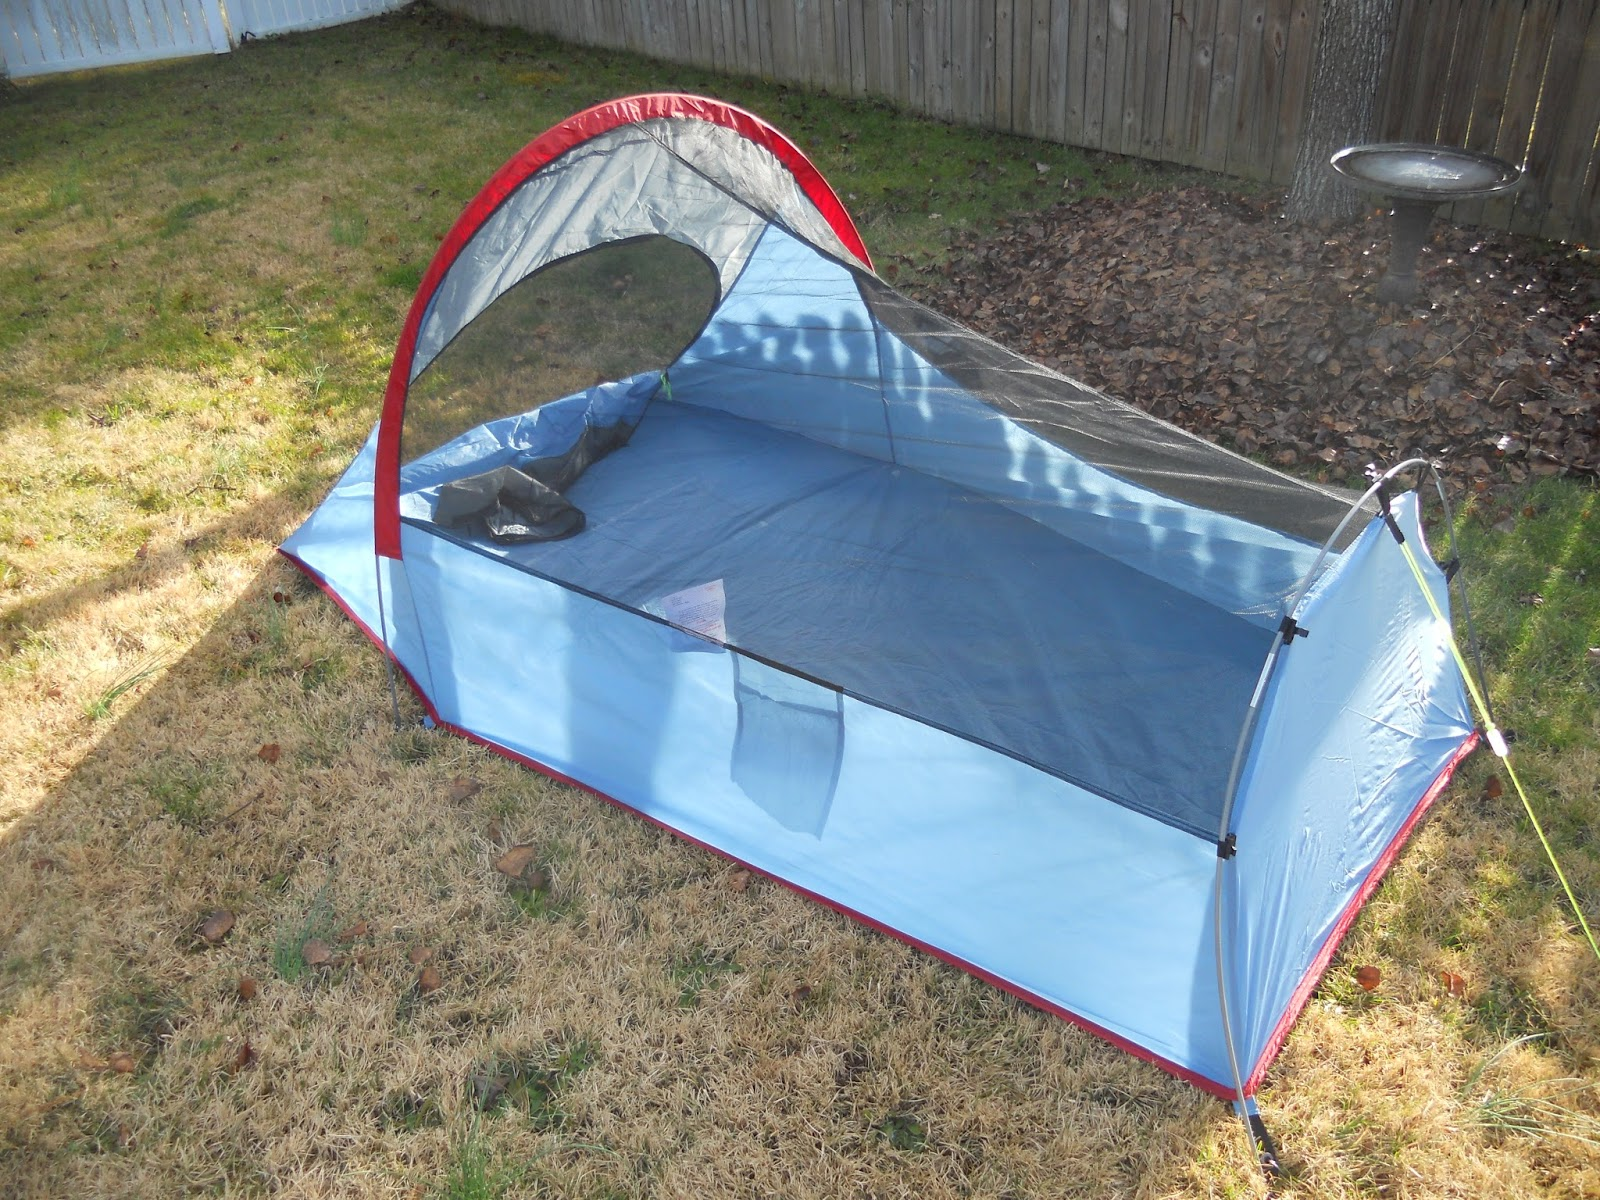 Texsport Saguaro Bivy Shelter Tent offers a great value! & Texsport Saguaro Bivy Shelter Tent: Texsport Saguaro Bivy Shelter ...